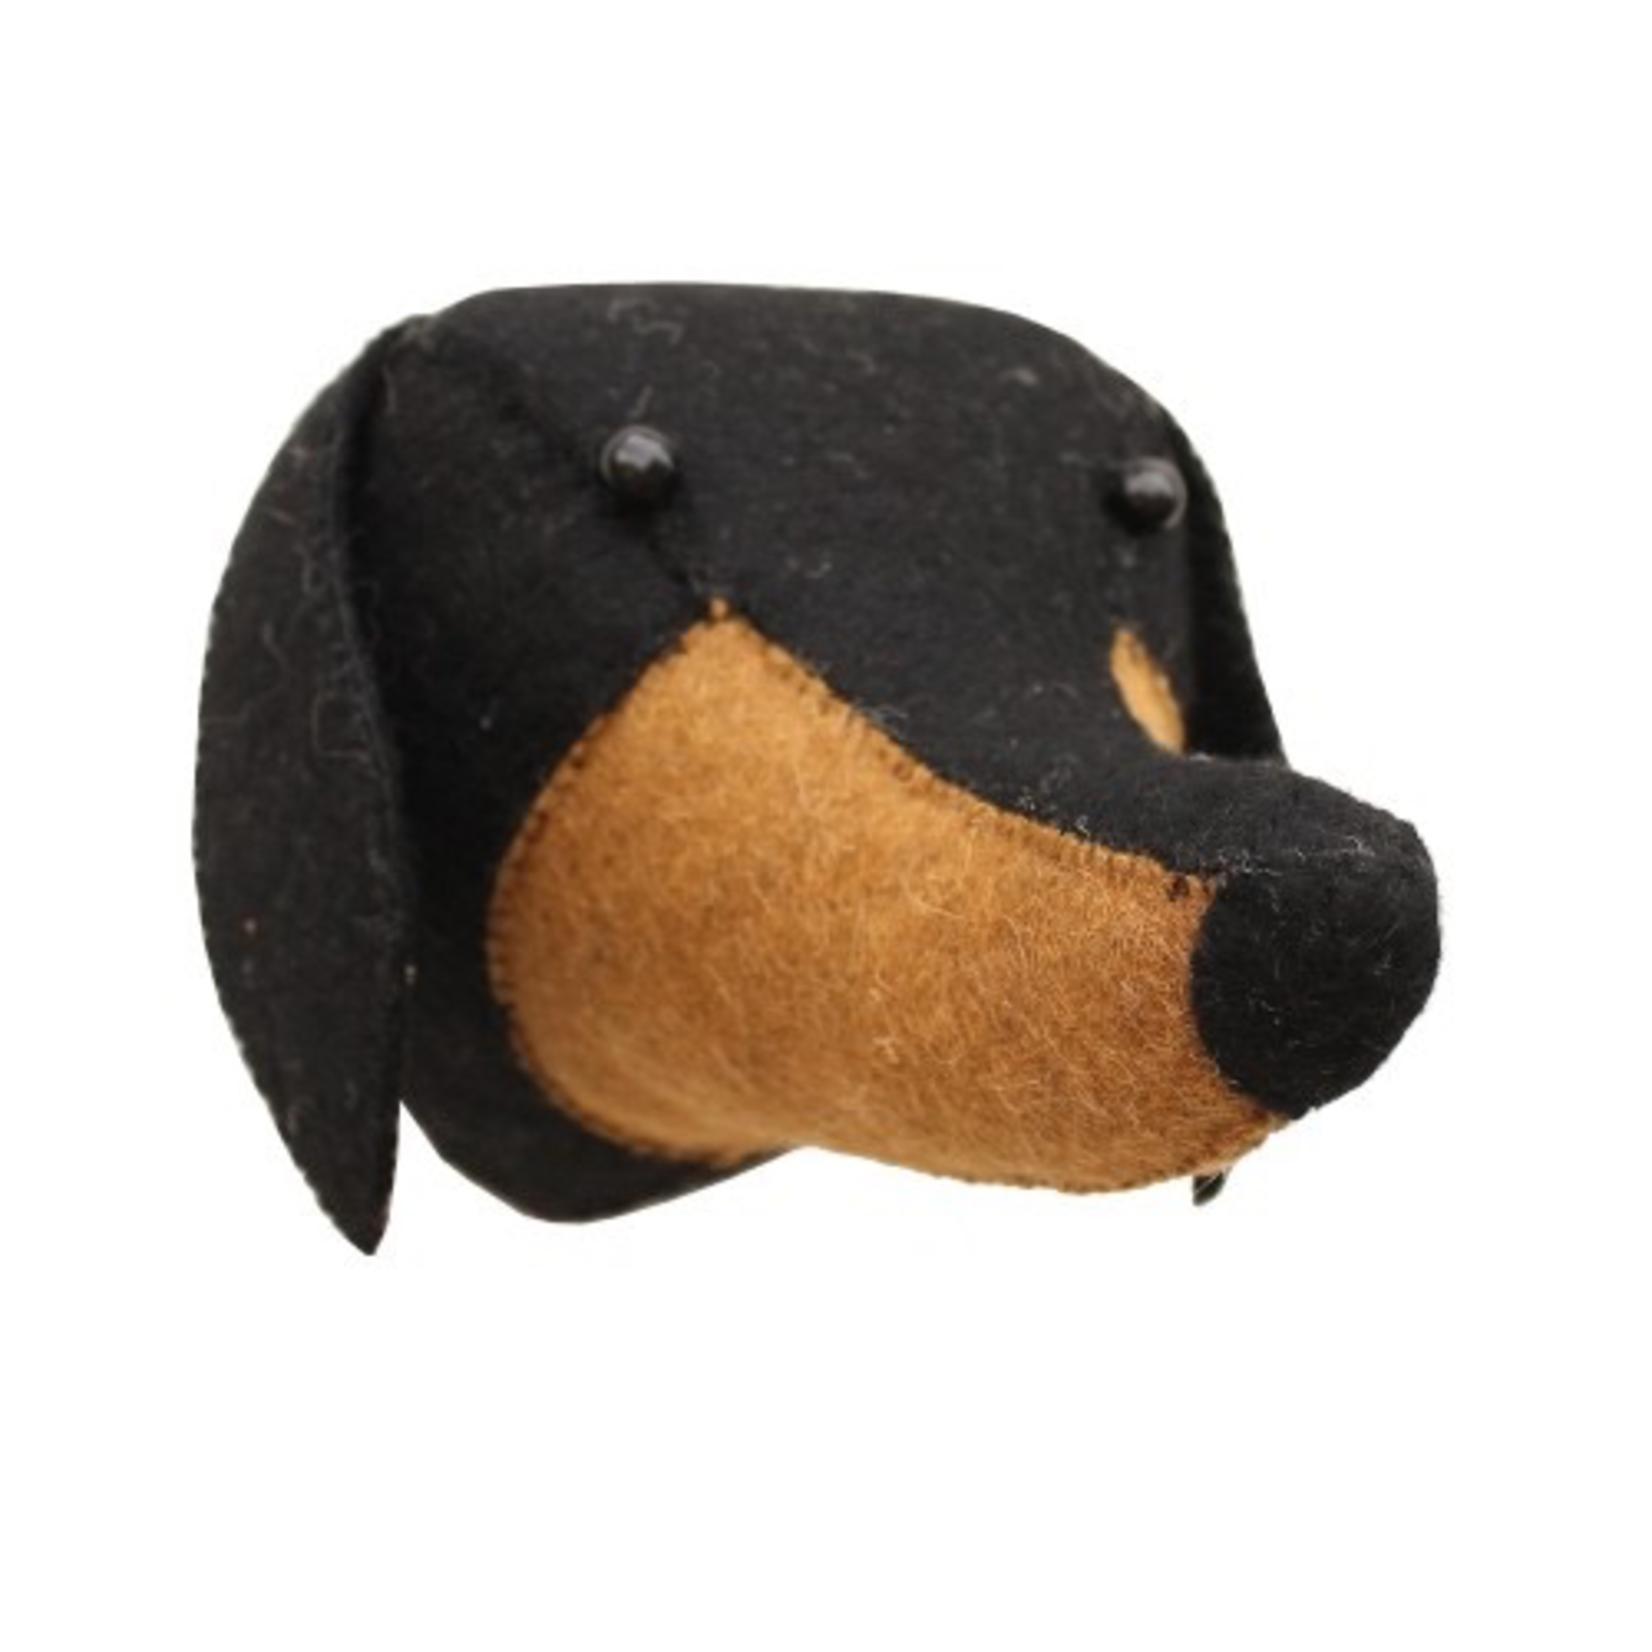 Fiona Walker Fiona Walker Dachshund Dog Head